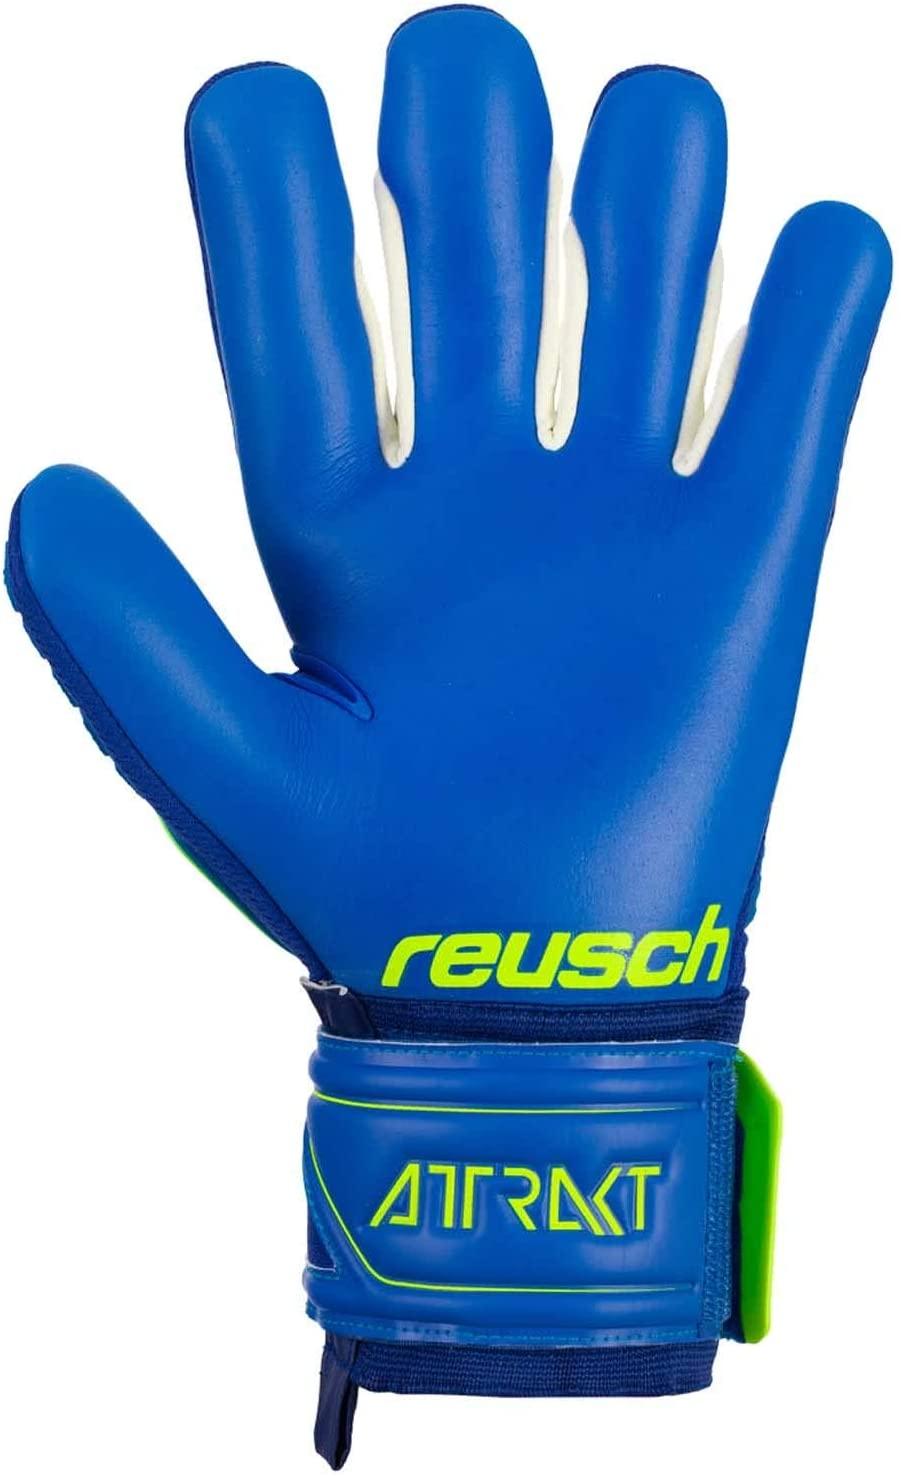 Reusch Attrakt Freegel G3 Fingersafe TW-Handschuh 5070930 gelb blau